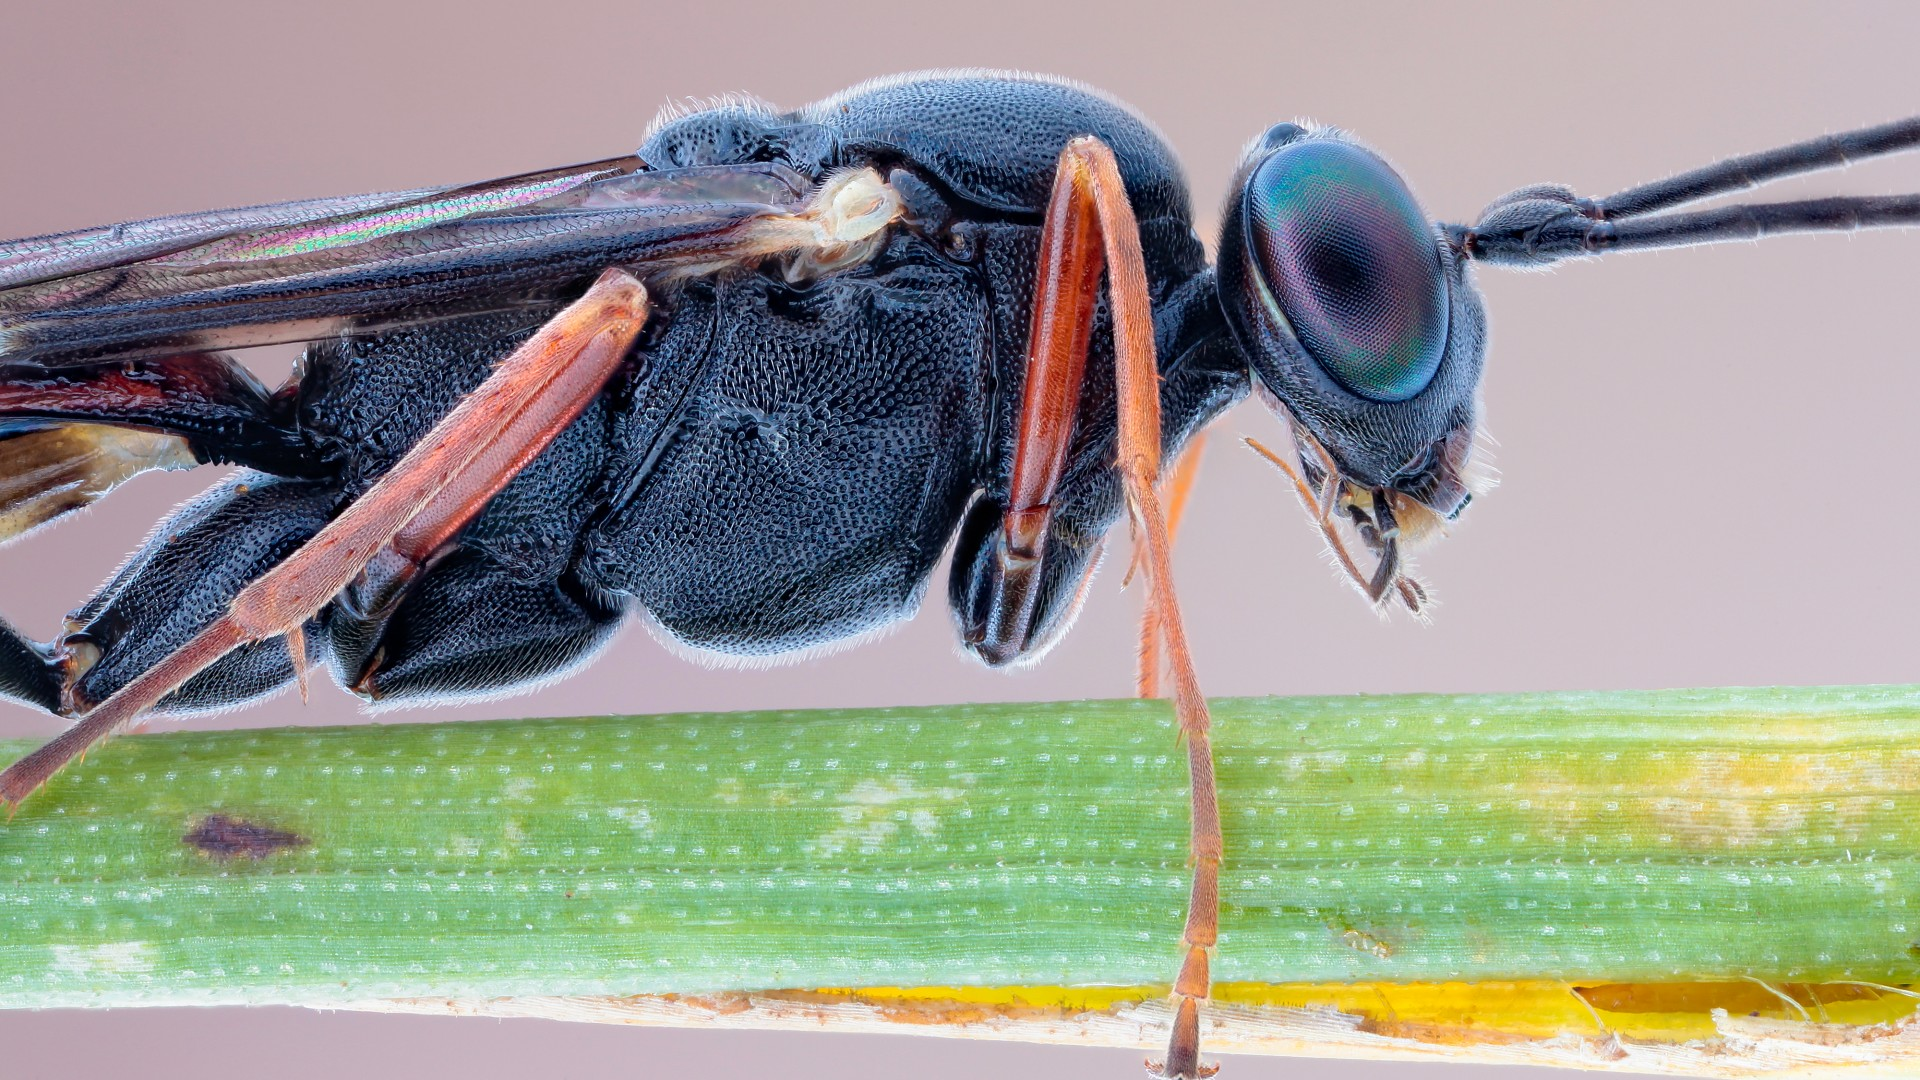 Eyes Of A Dragonfly Nature Dew Cute Macro Hd Wallpaper: Wallpaper Slender Parasite, Insects, Macro, Eyes, Black